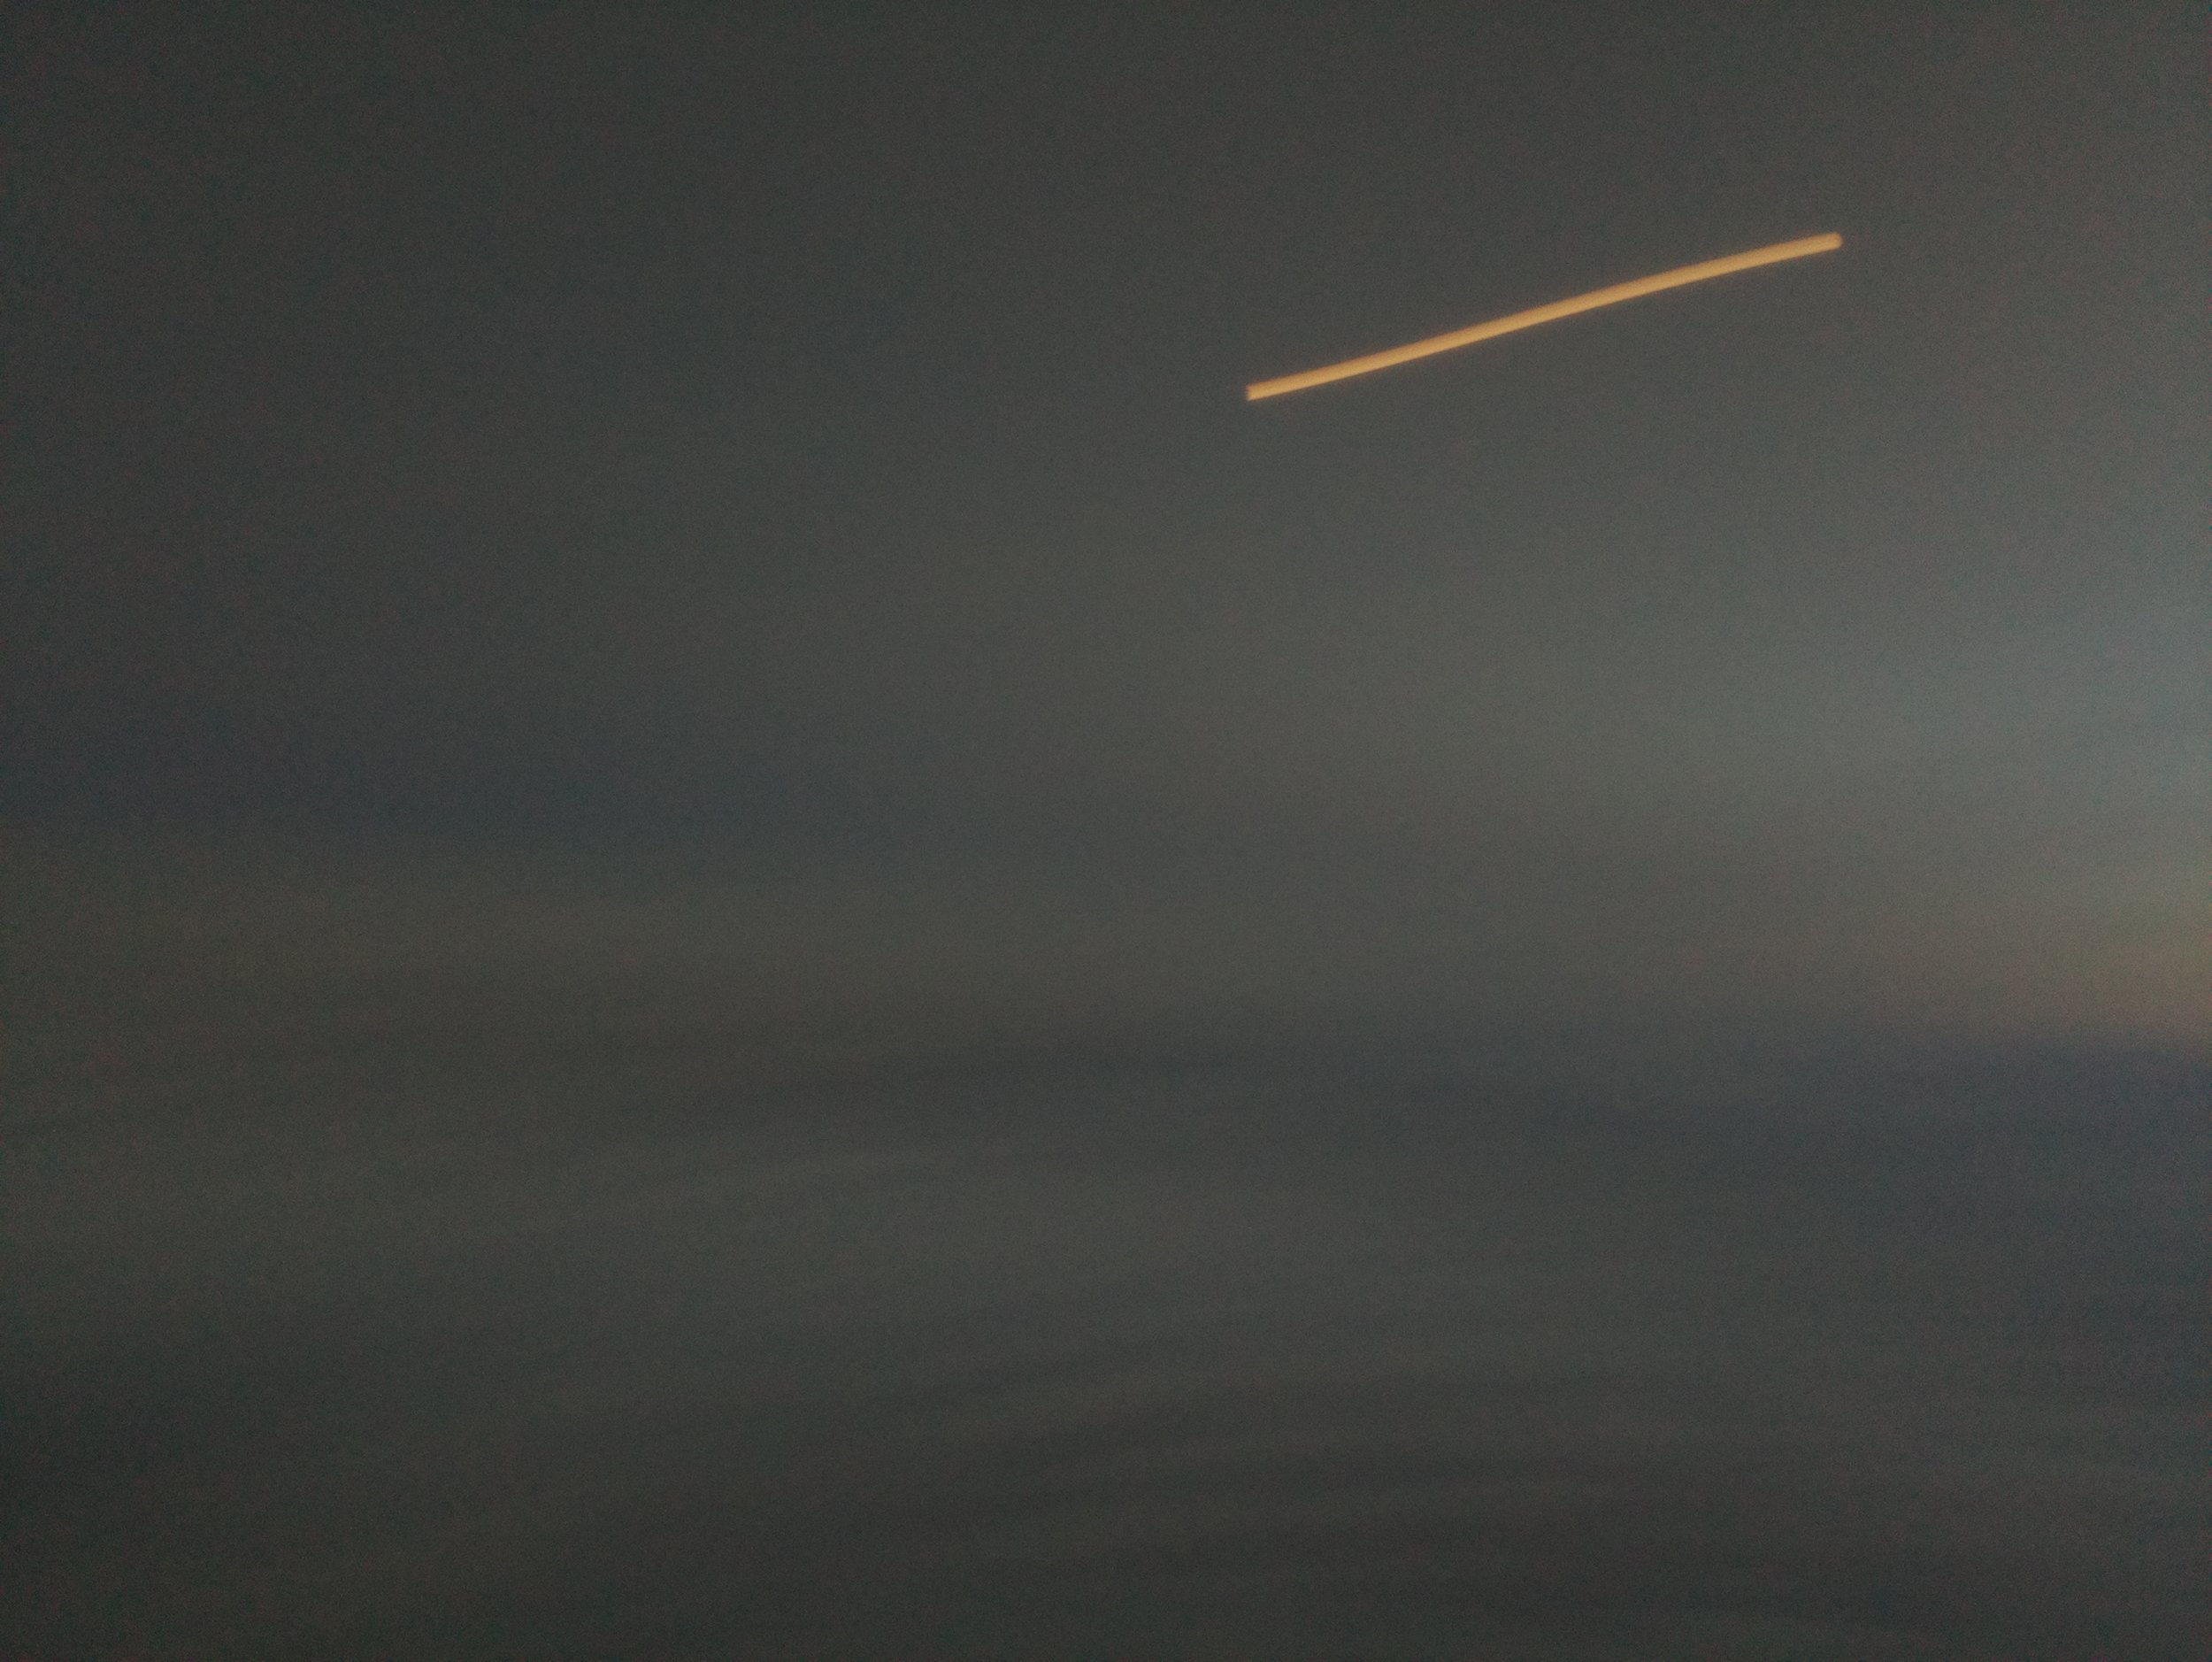 Mystery light captured by Buzz the Bear's camera